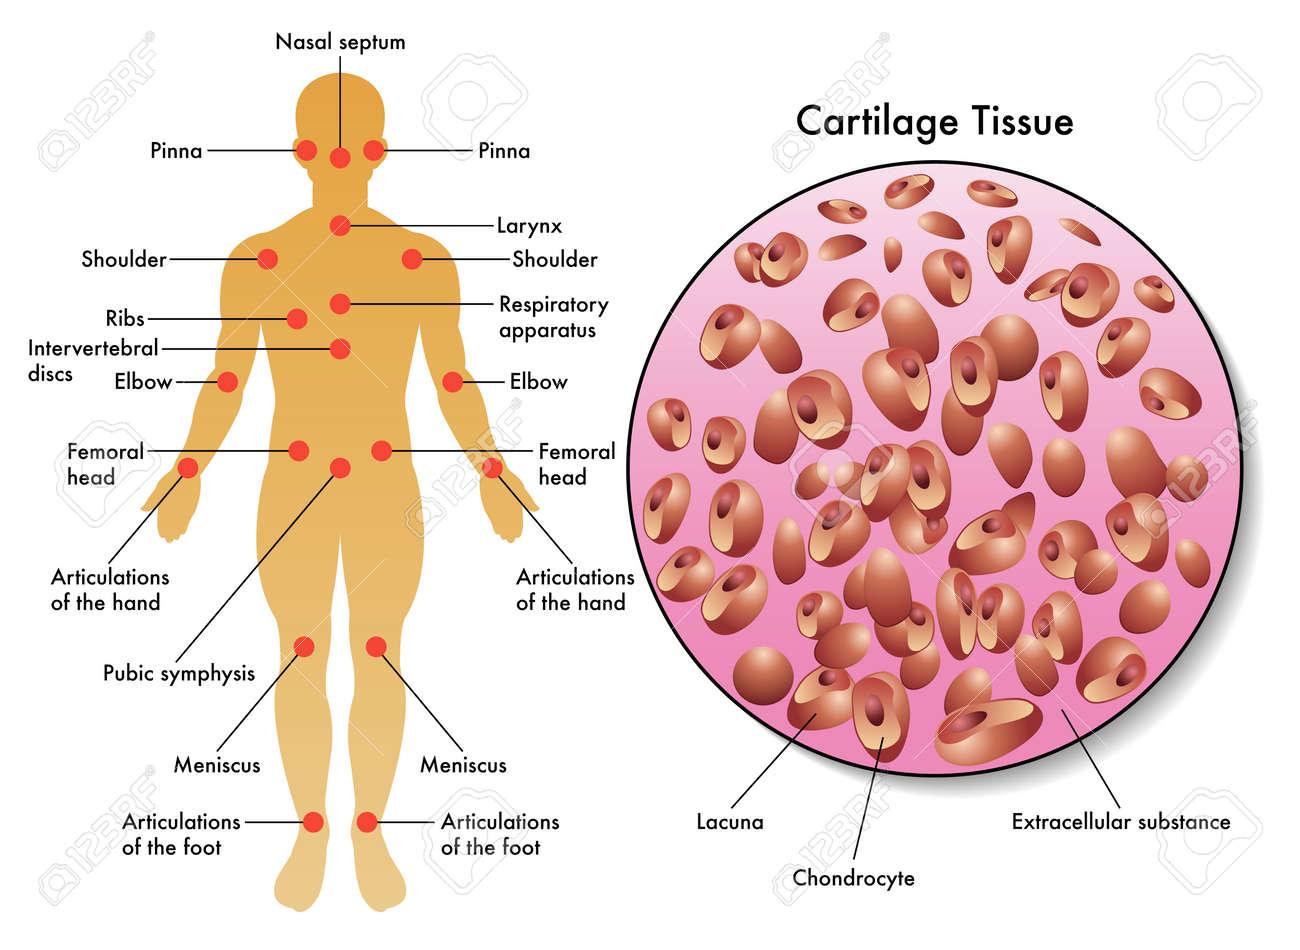 cartilage tissue - 38250872